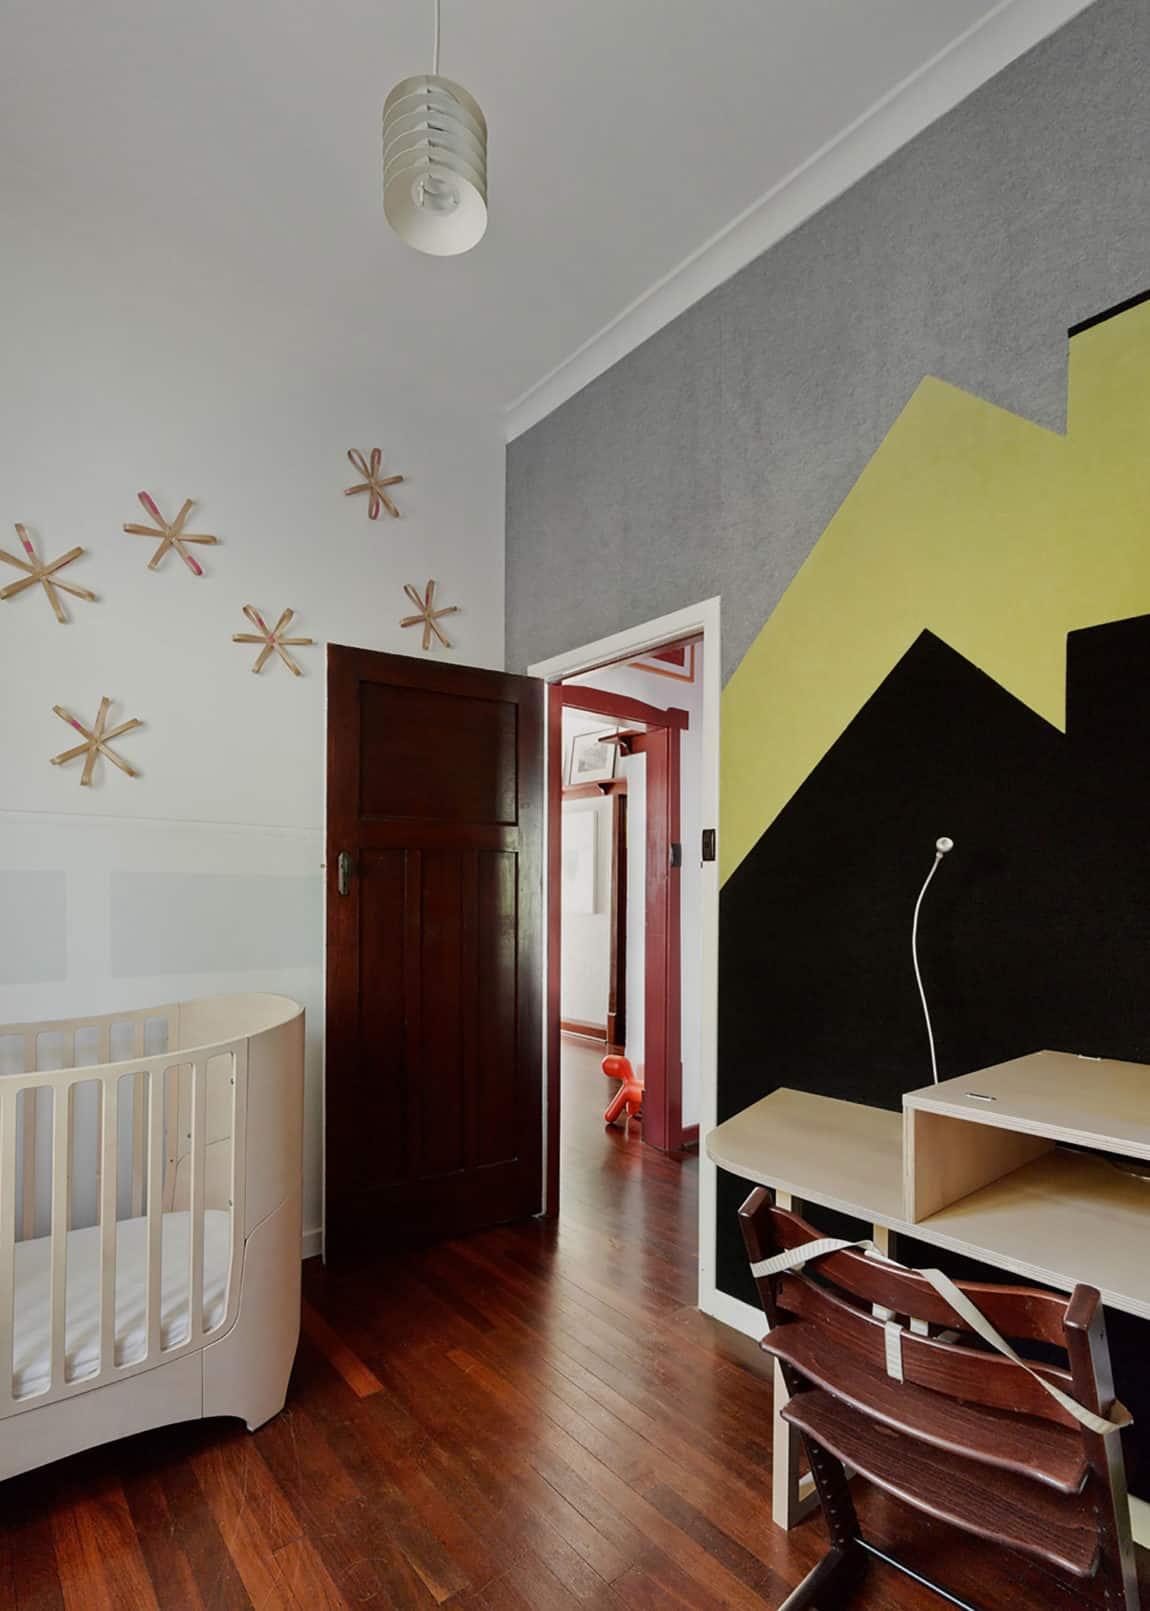 Casa 31_4 Room House by Iredale Pedersen Hook (28)